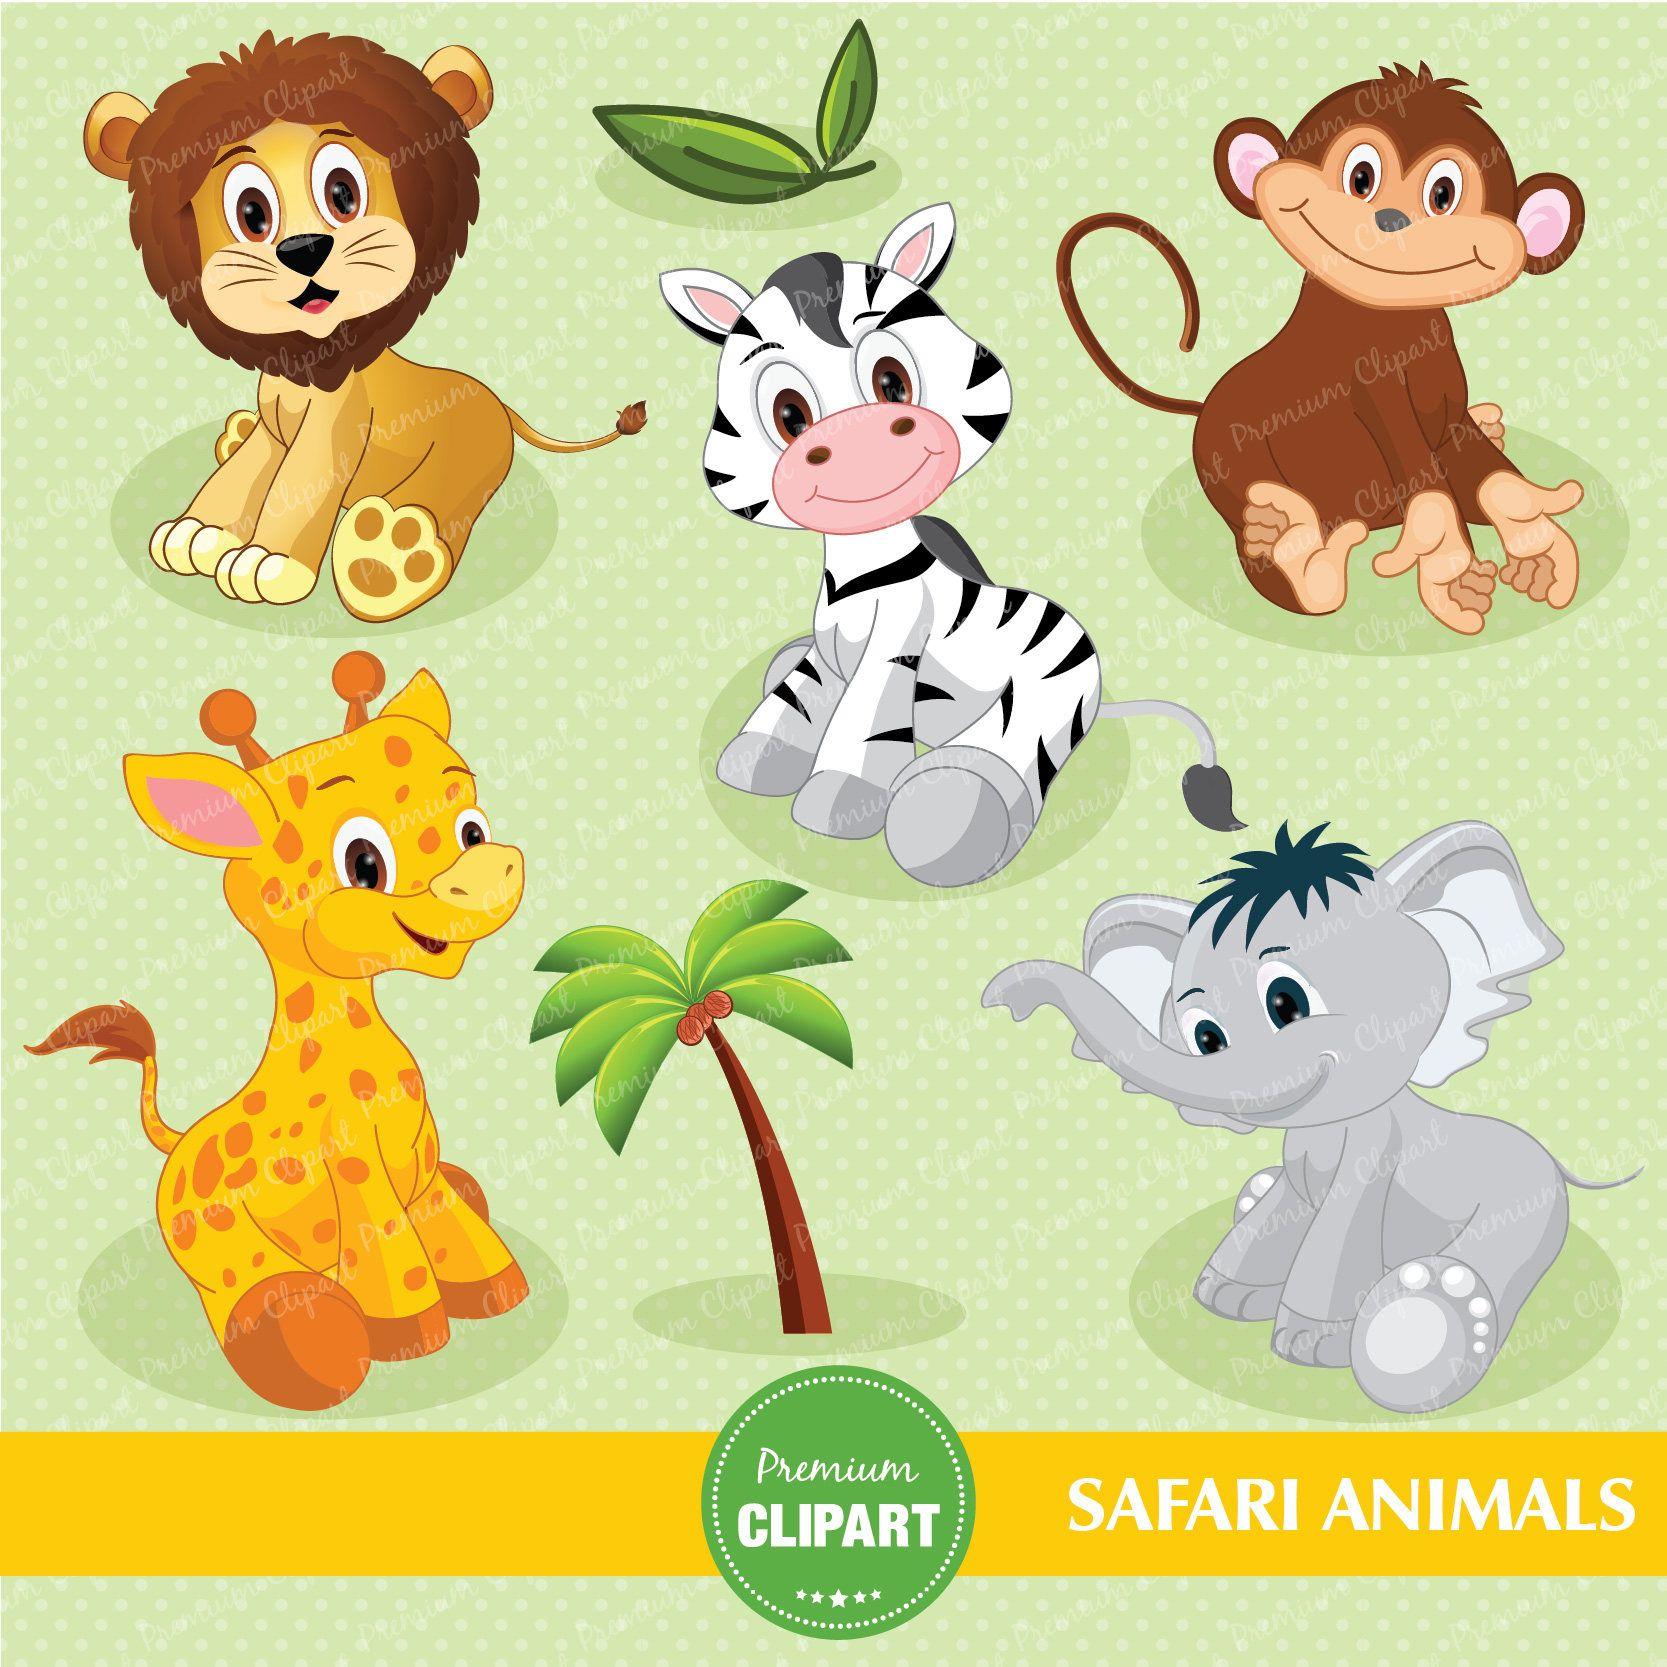 Safari Animals Digital Clipart Jungle Clip Art Baby Shower Clipart Nursery Clipart Jungle Animals Clipart Ca138 Baby Jungle Animals Safari Baby Animals Baby Animals